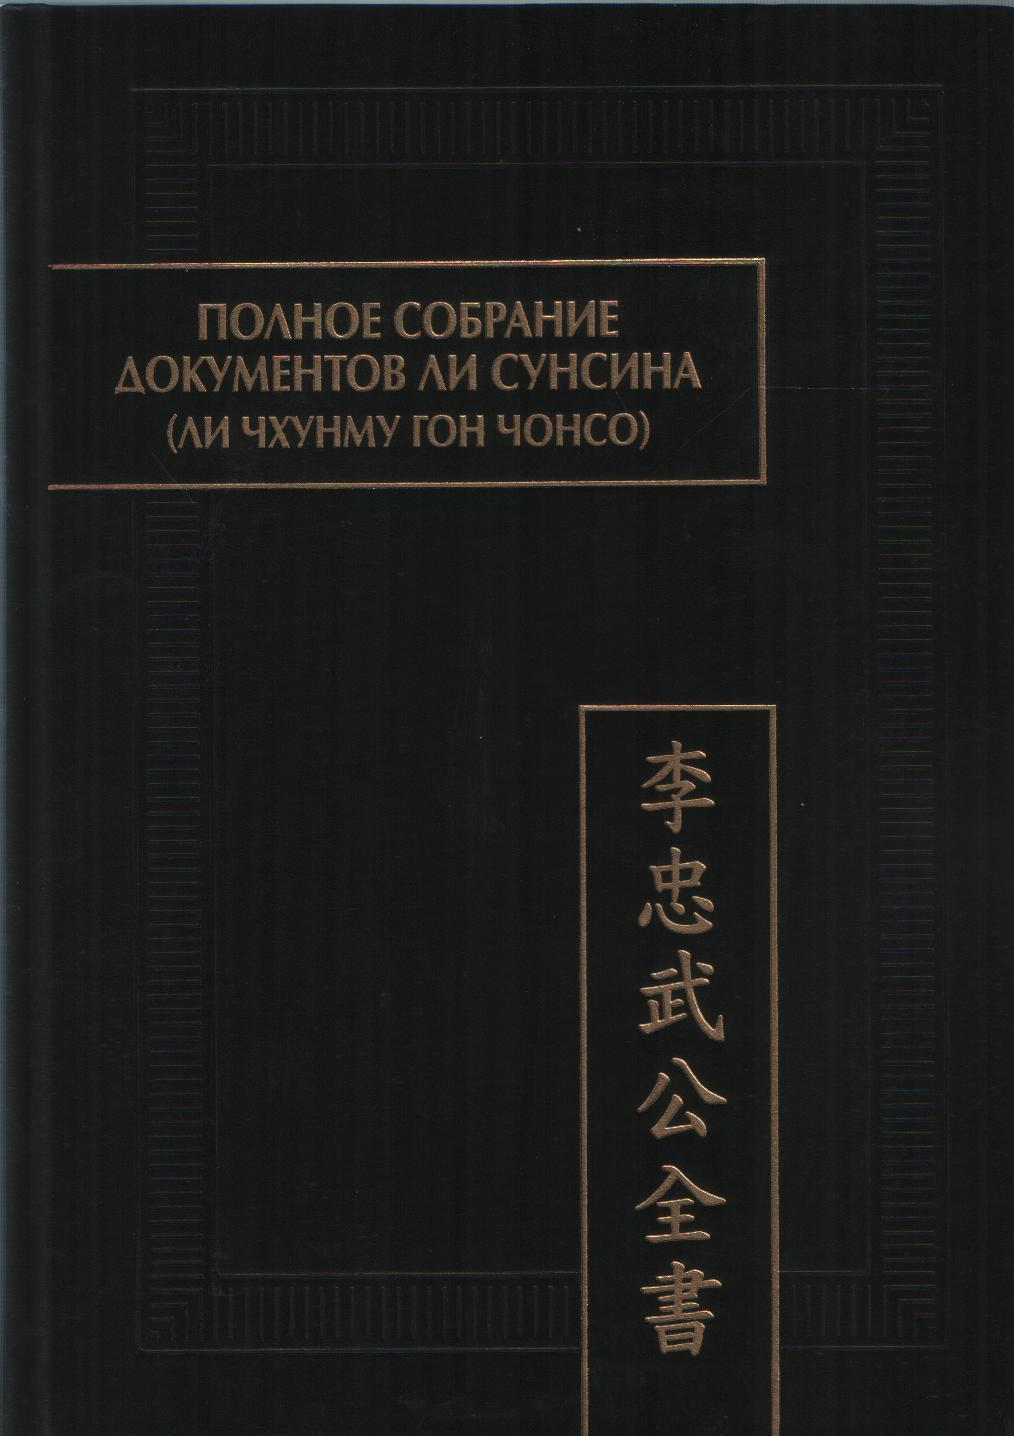 Полное собрание документов Ли Сунсина (Ли Чхунму гон чонсо).